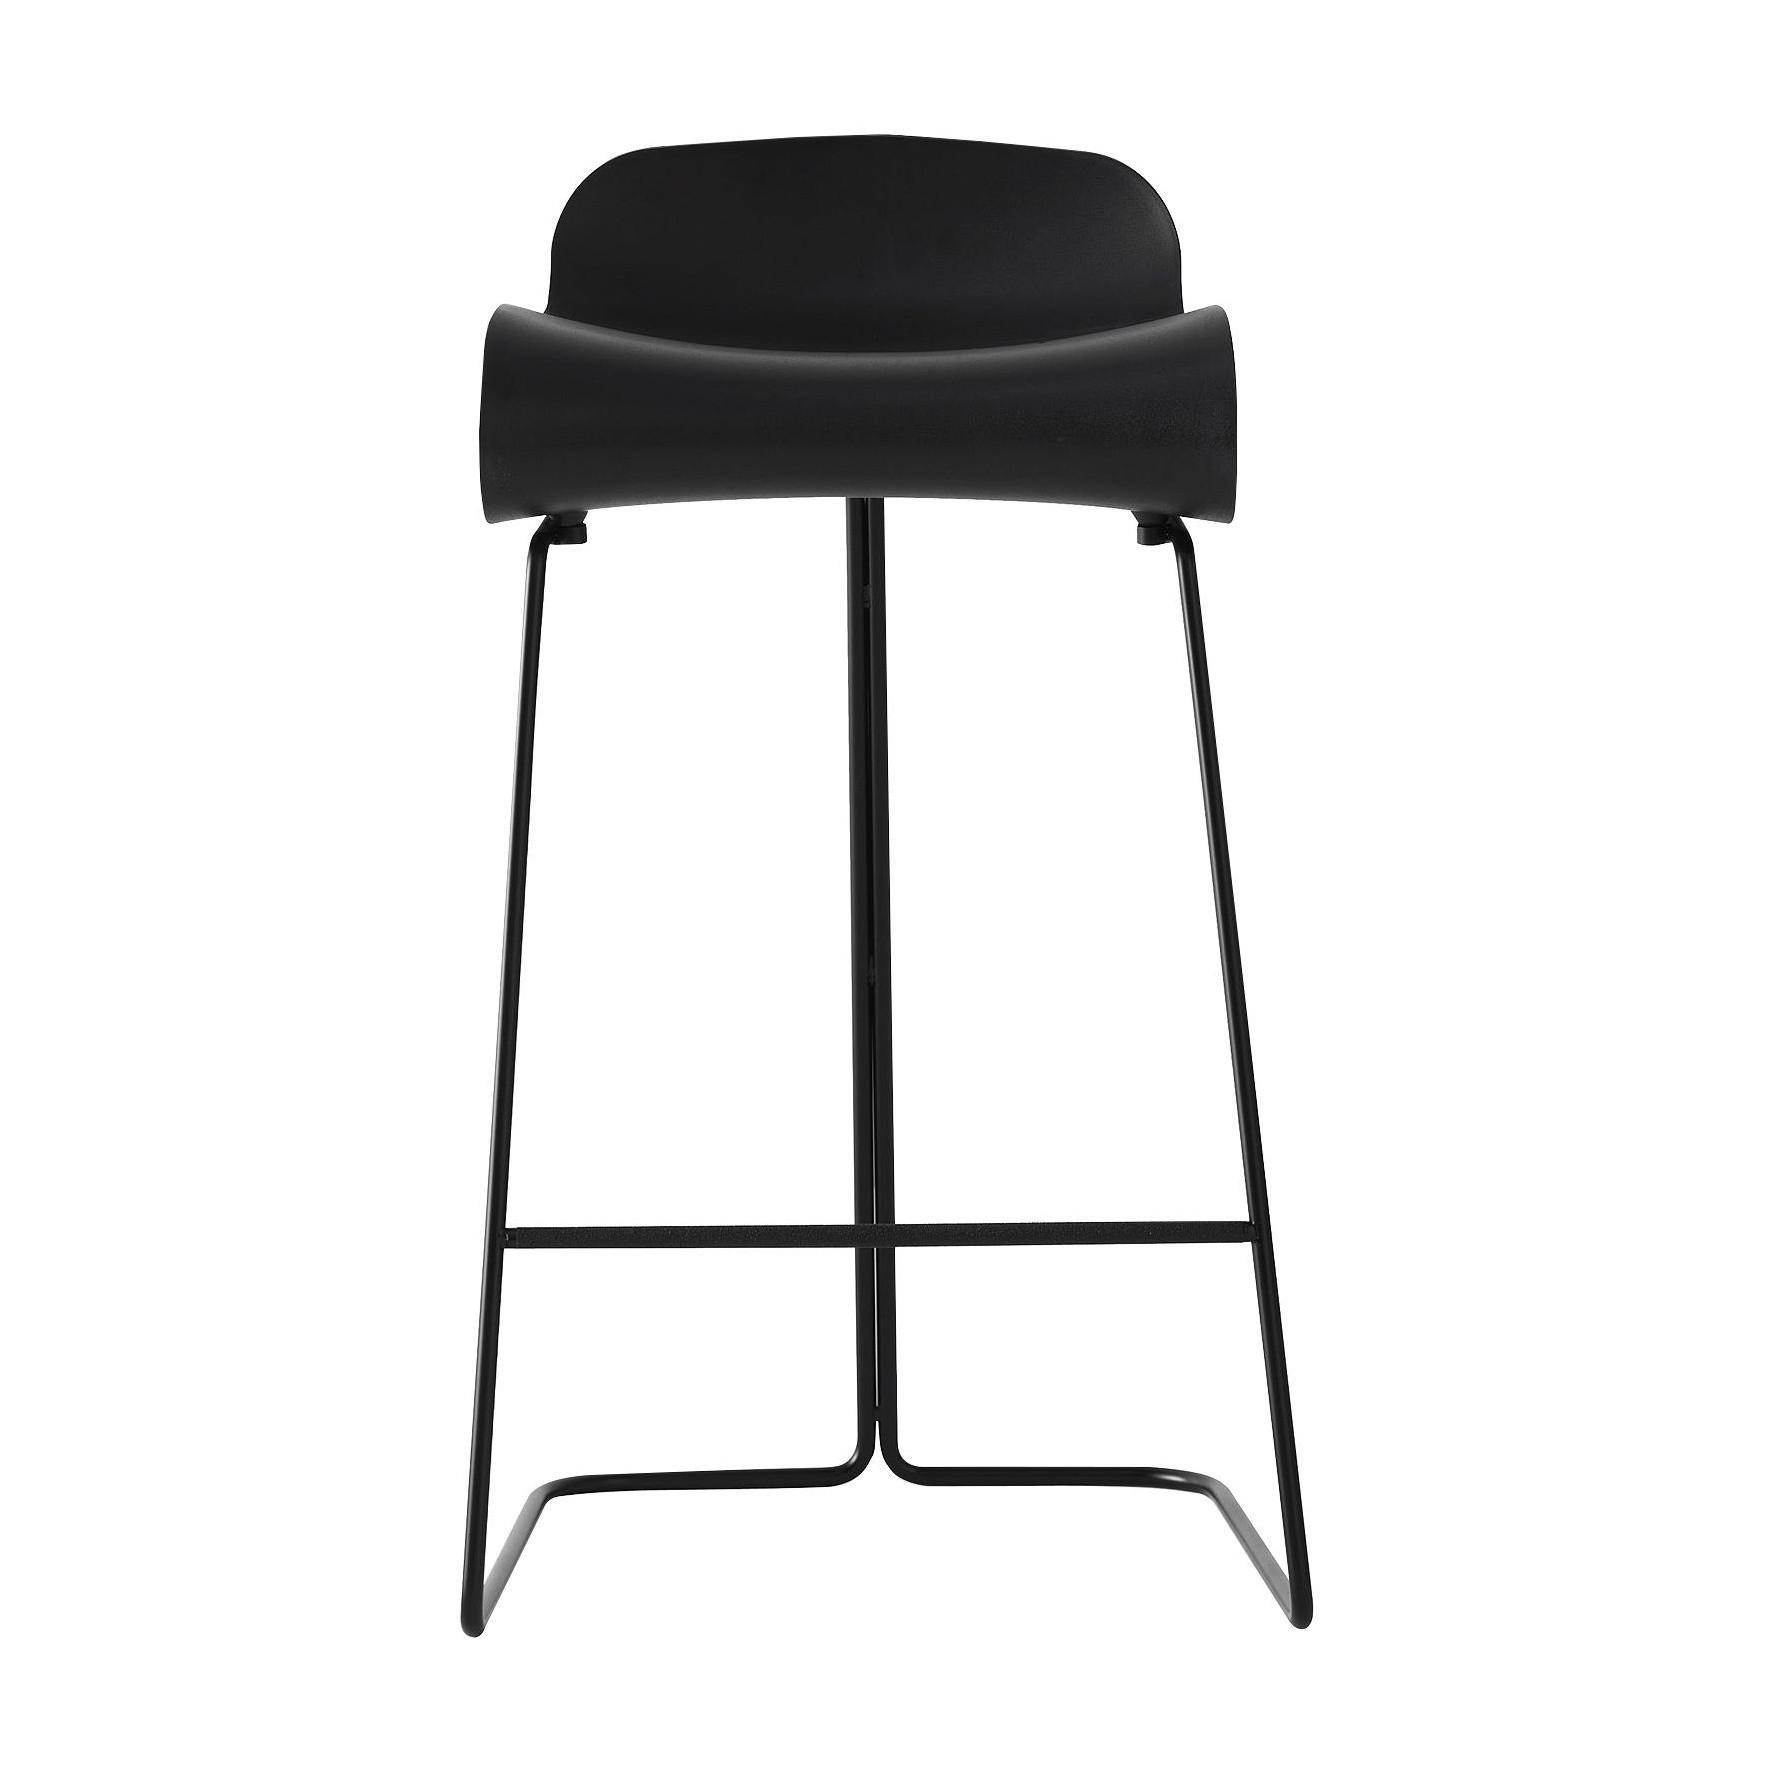 Cool Bcn Stool Bar Stool Creativecarmelina Interior Chair Design Creativecarmelinacom